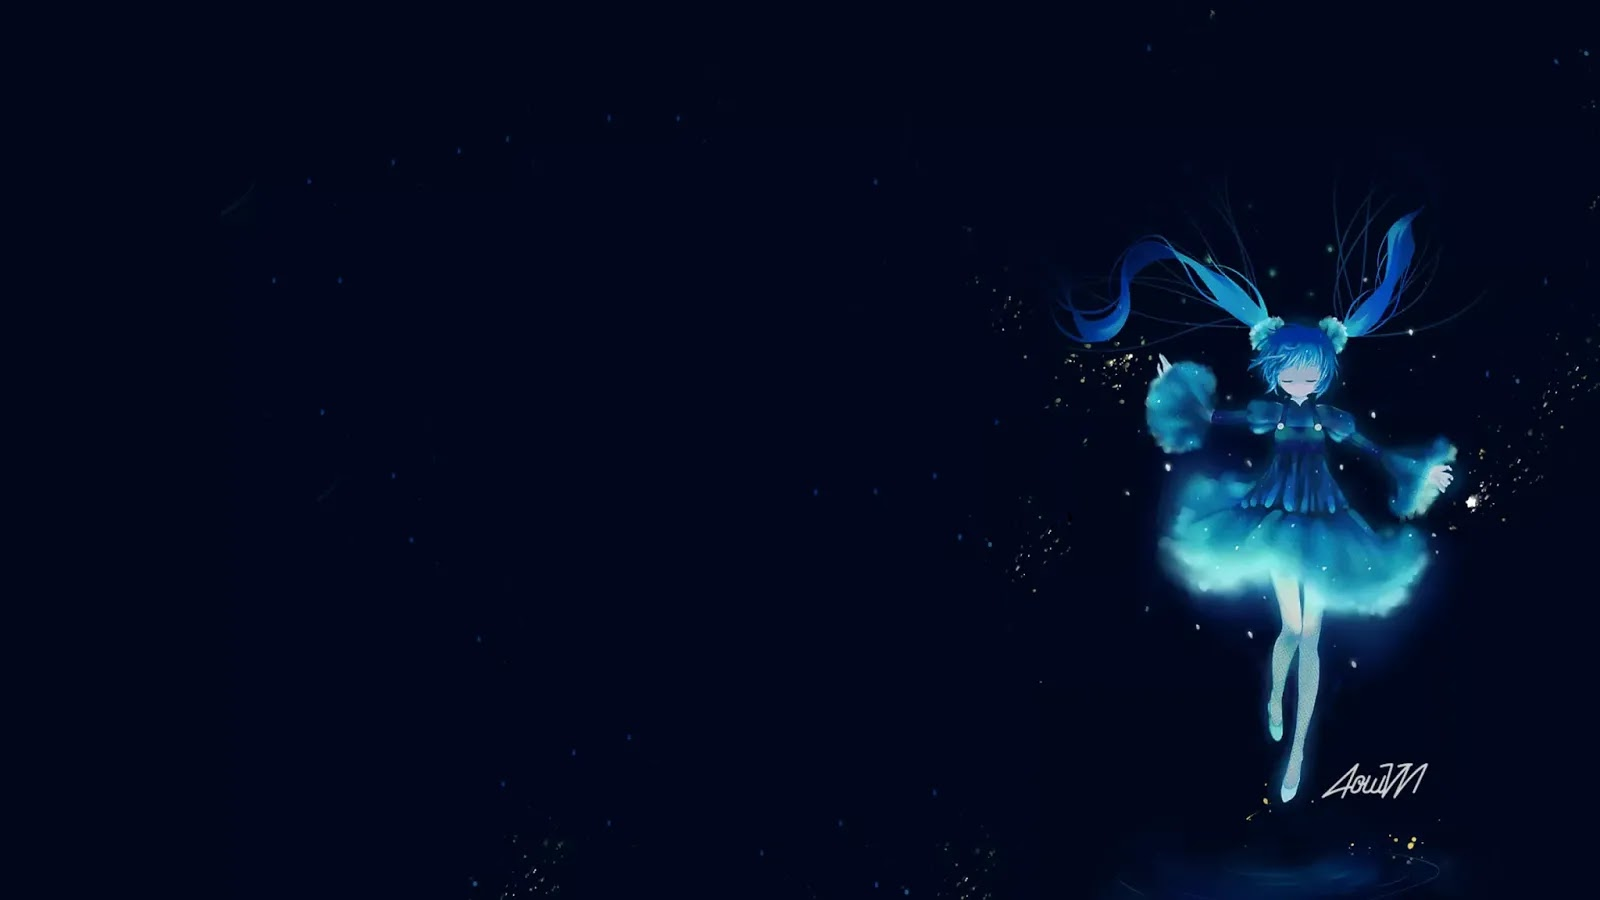 AowVN.org Background - AowVN 2018 - Sẽ Có Gì Mứi ?